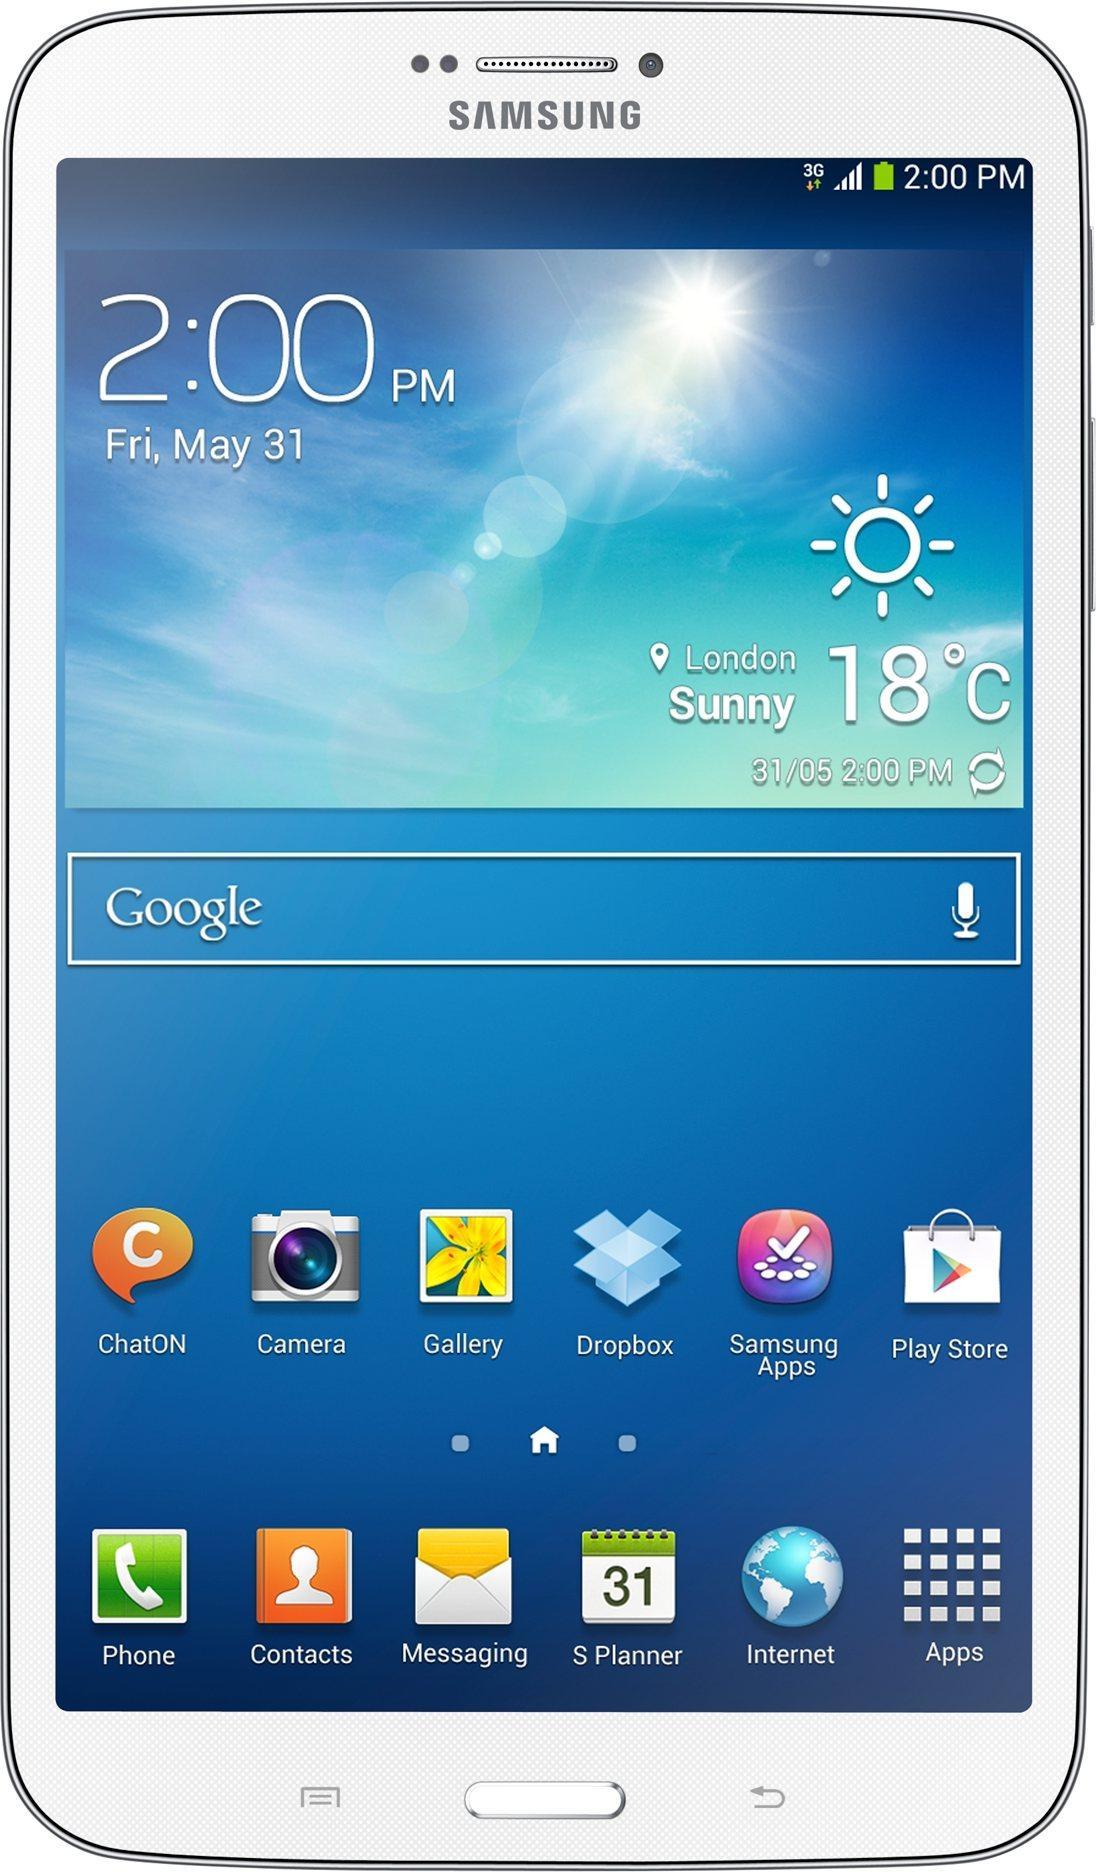 Galaxy Tab 3 8.0 (WiFi) SM-T311